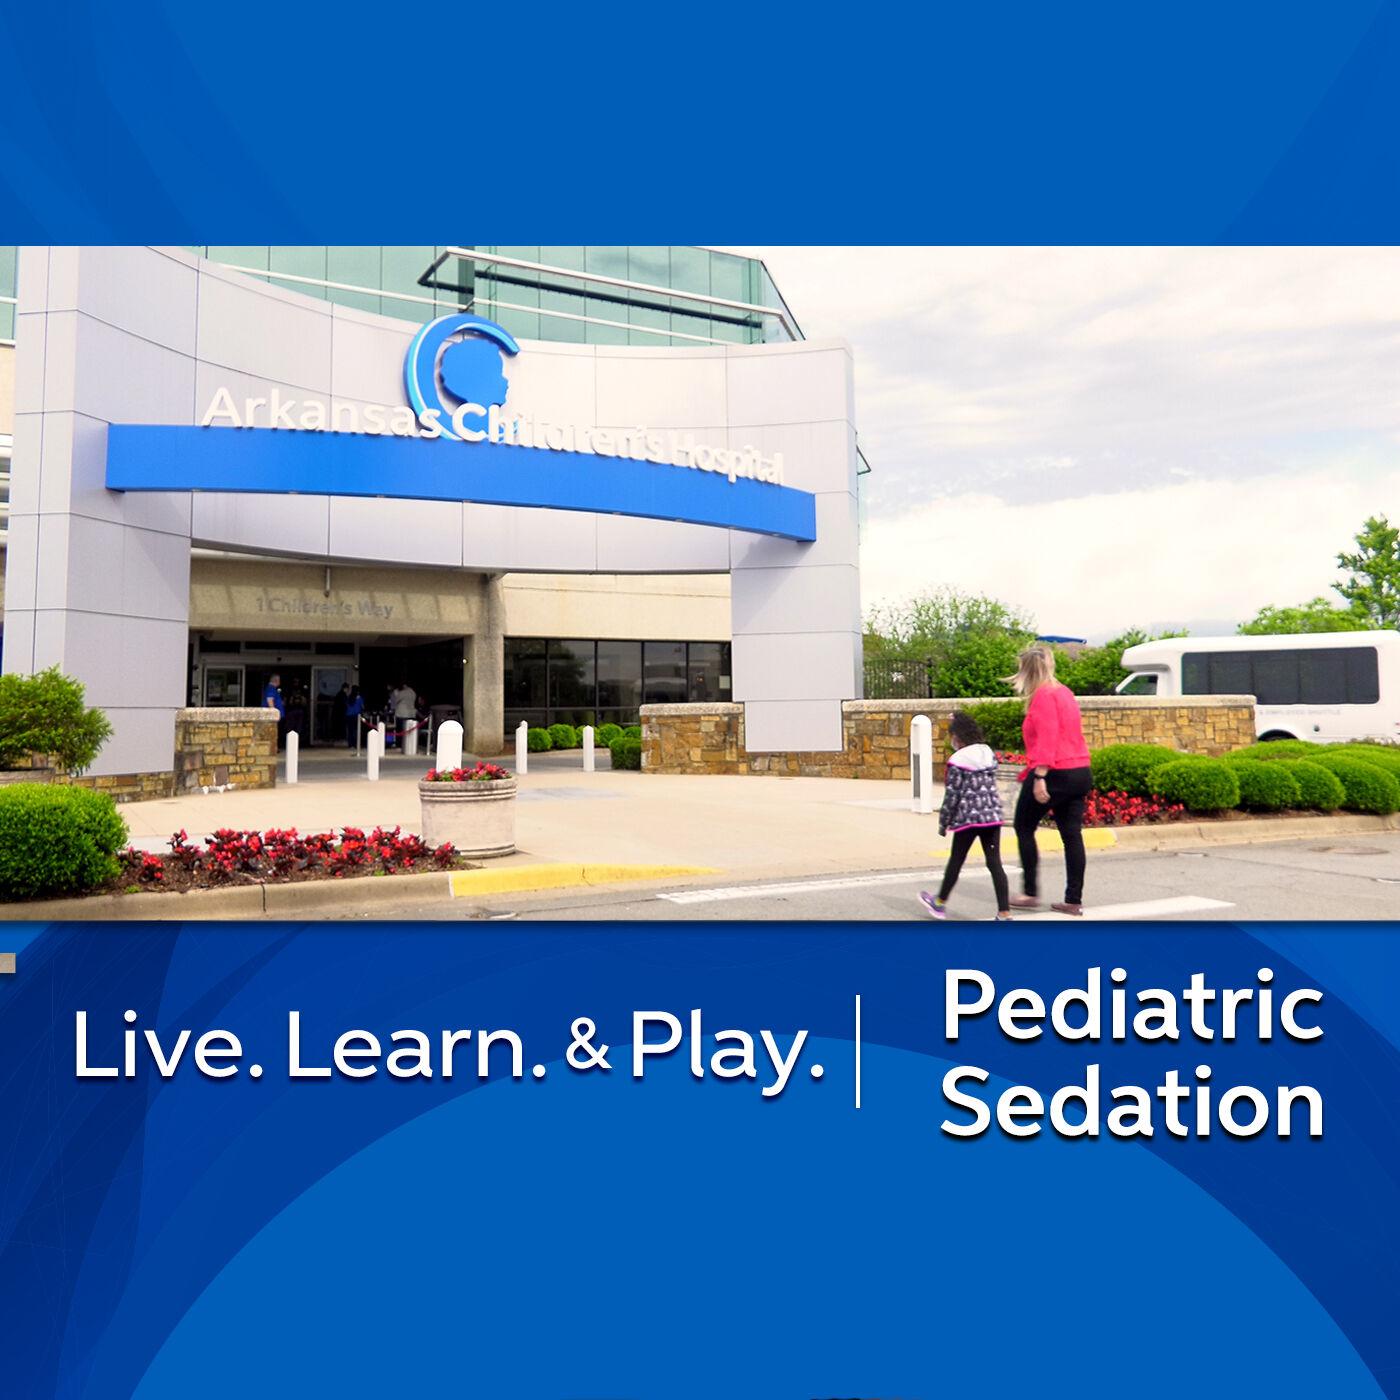 Pediatric Sedation at Arkansas Children's Hospital